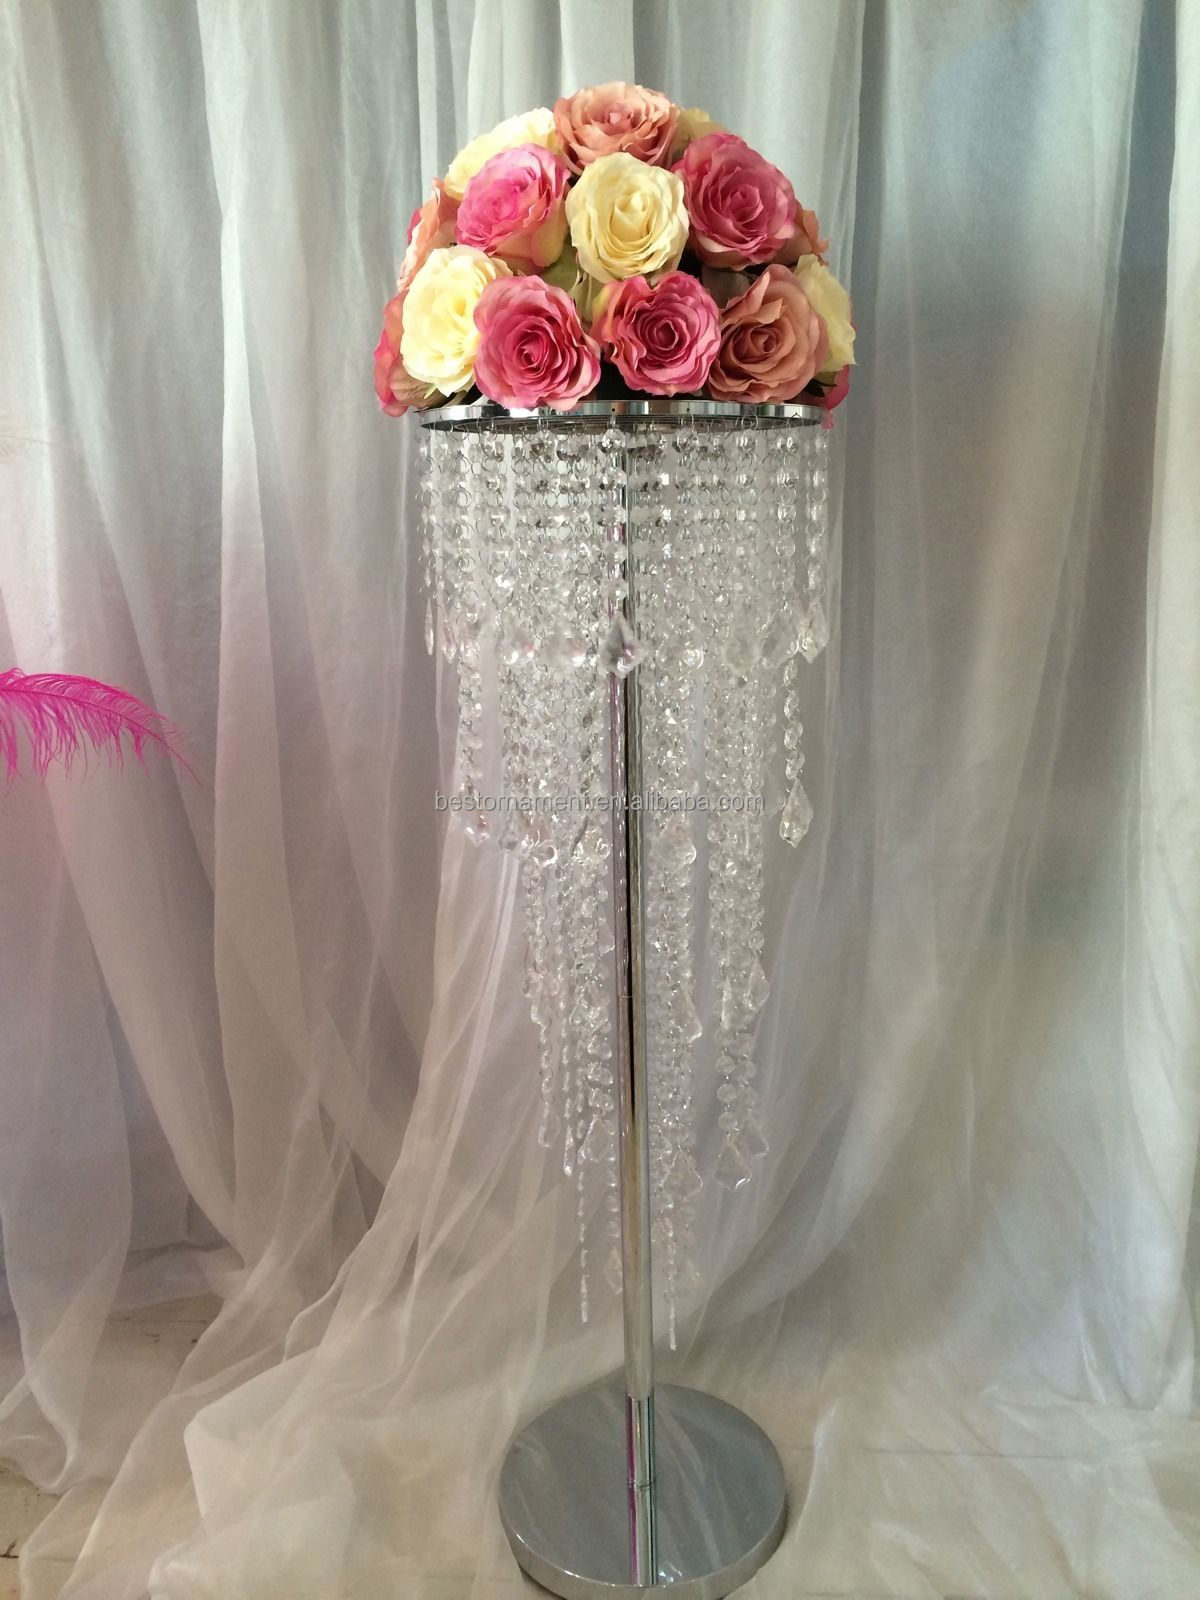 Crystal Chandelier Wedding Table Centerpieces